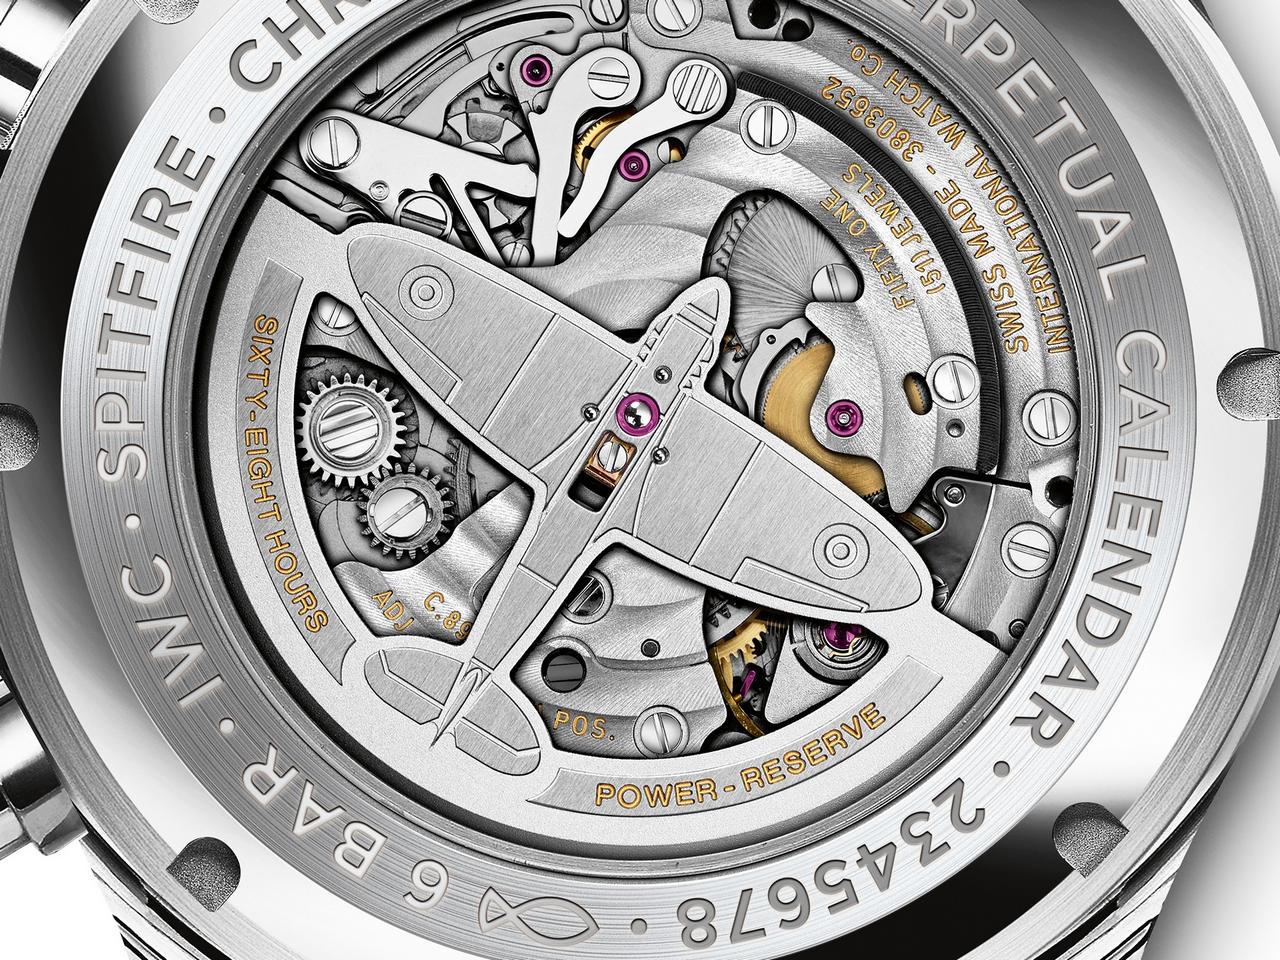 IWC-Big-Pilot-Watch-Perpetual-Calendar-Digital-Date-Month-Spitfire-Ref-379108_4